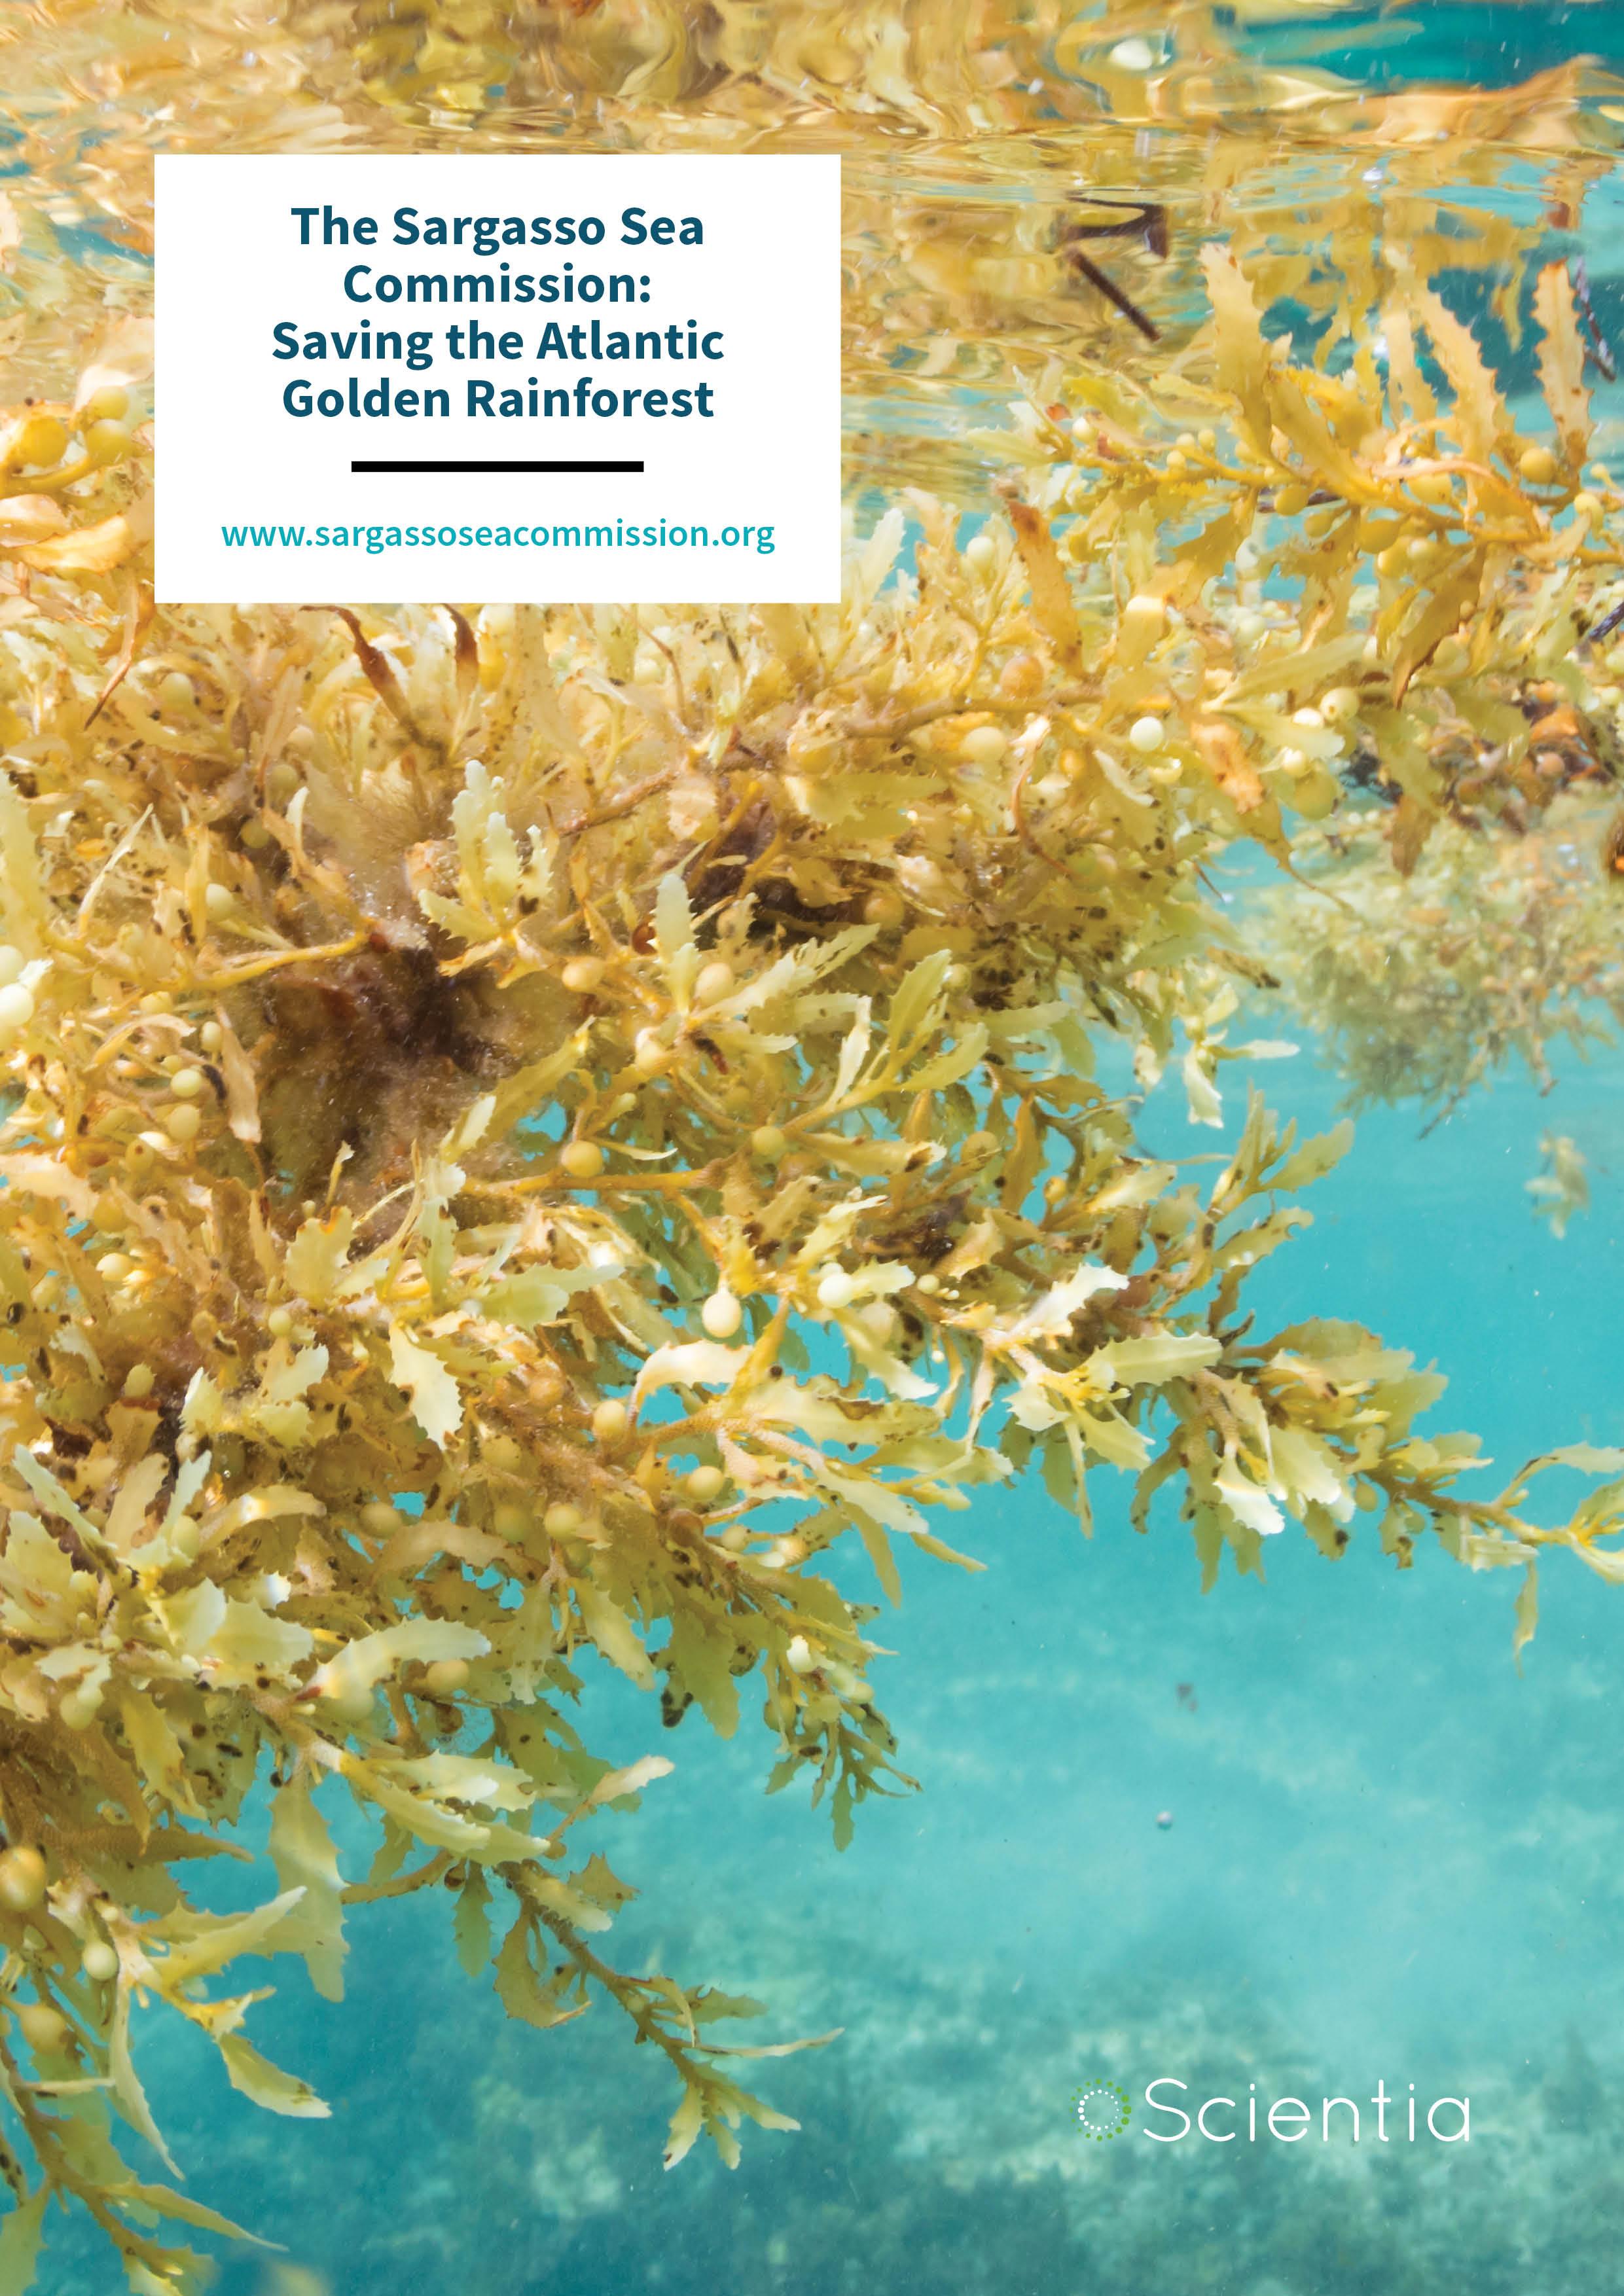 The Sargasso Sea Commission: Saving the Atlantic Golden Rainforest